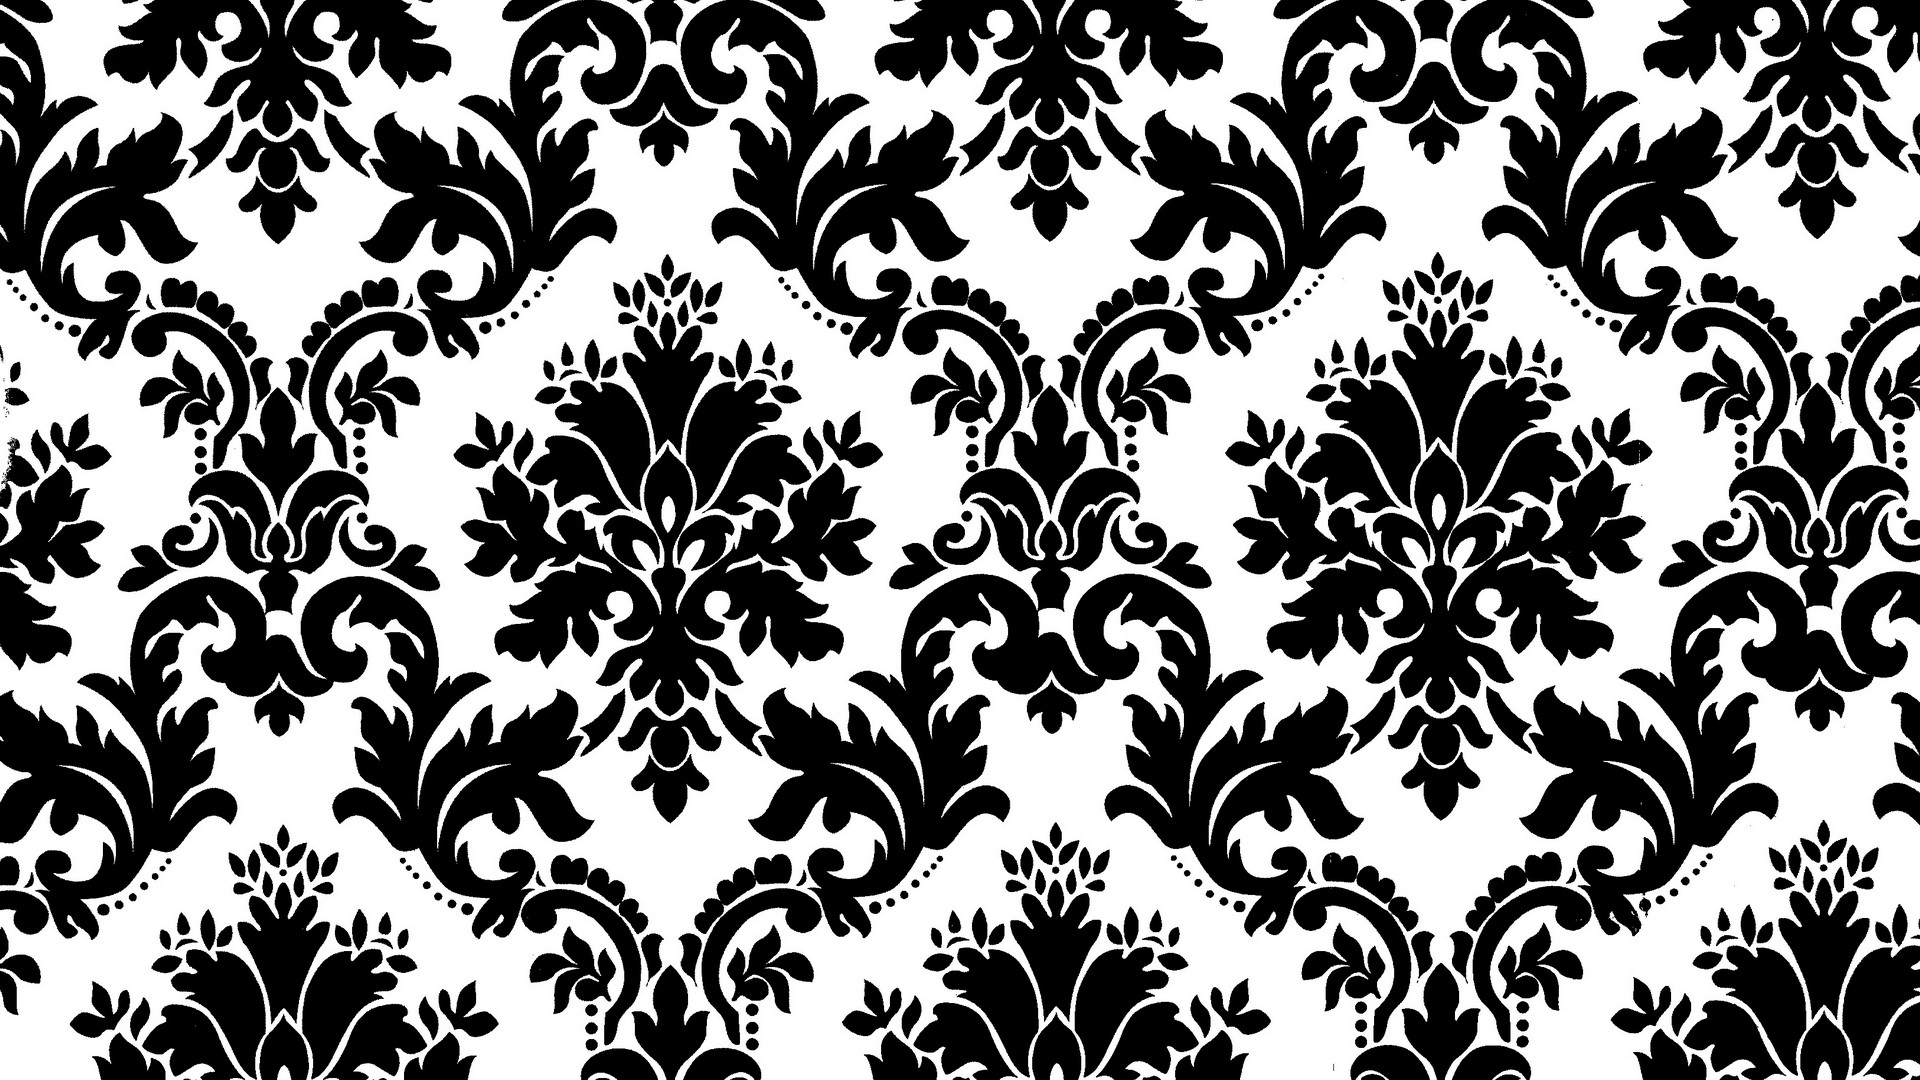 Black And White Pattern Backgrounds  Pixelstalknet